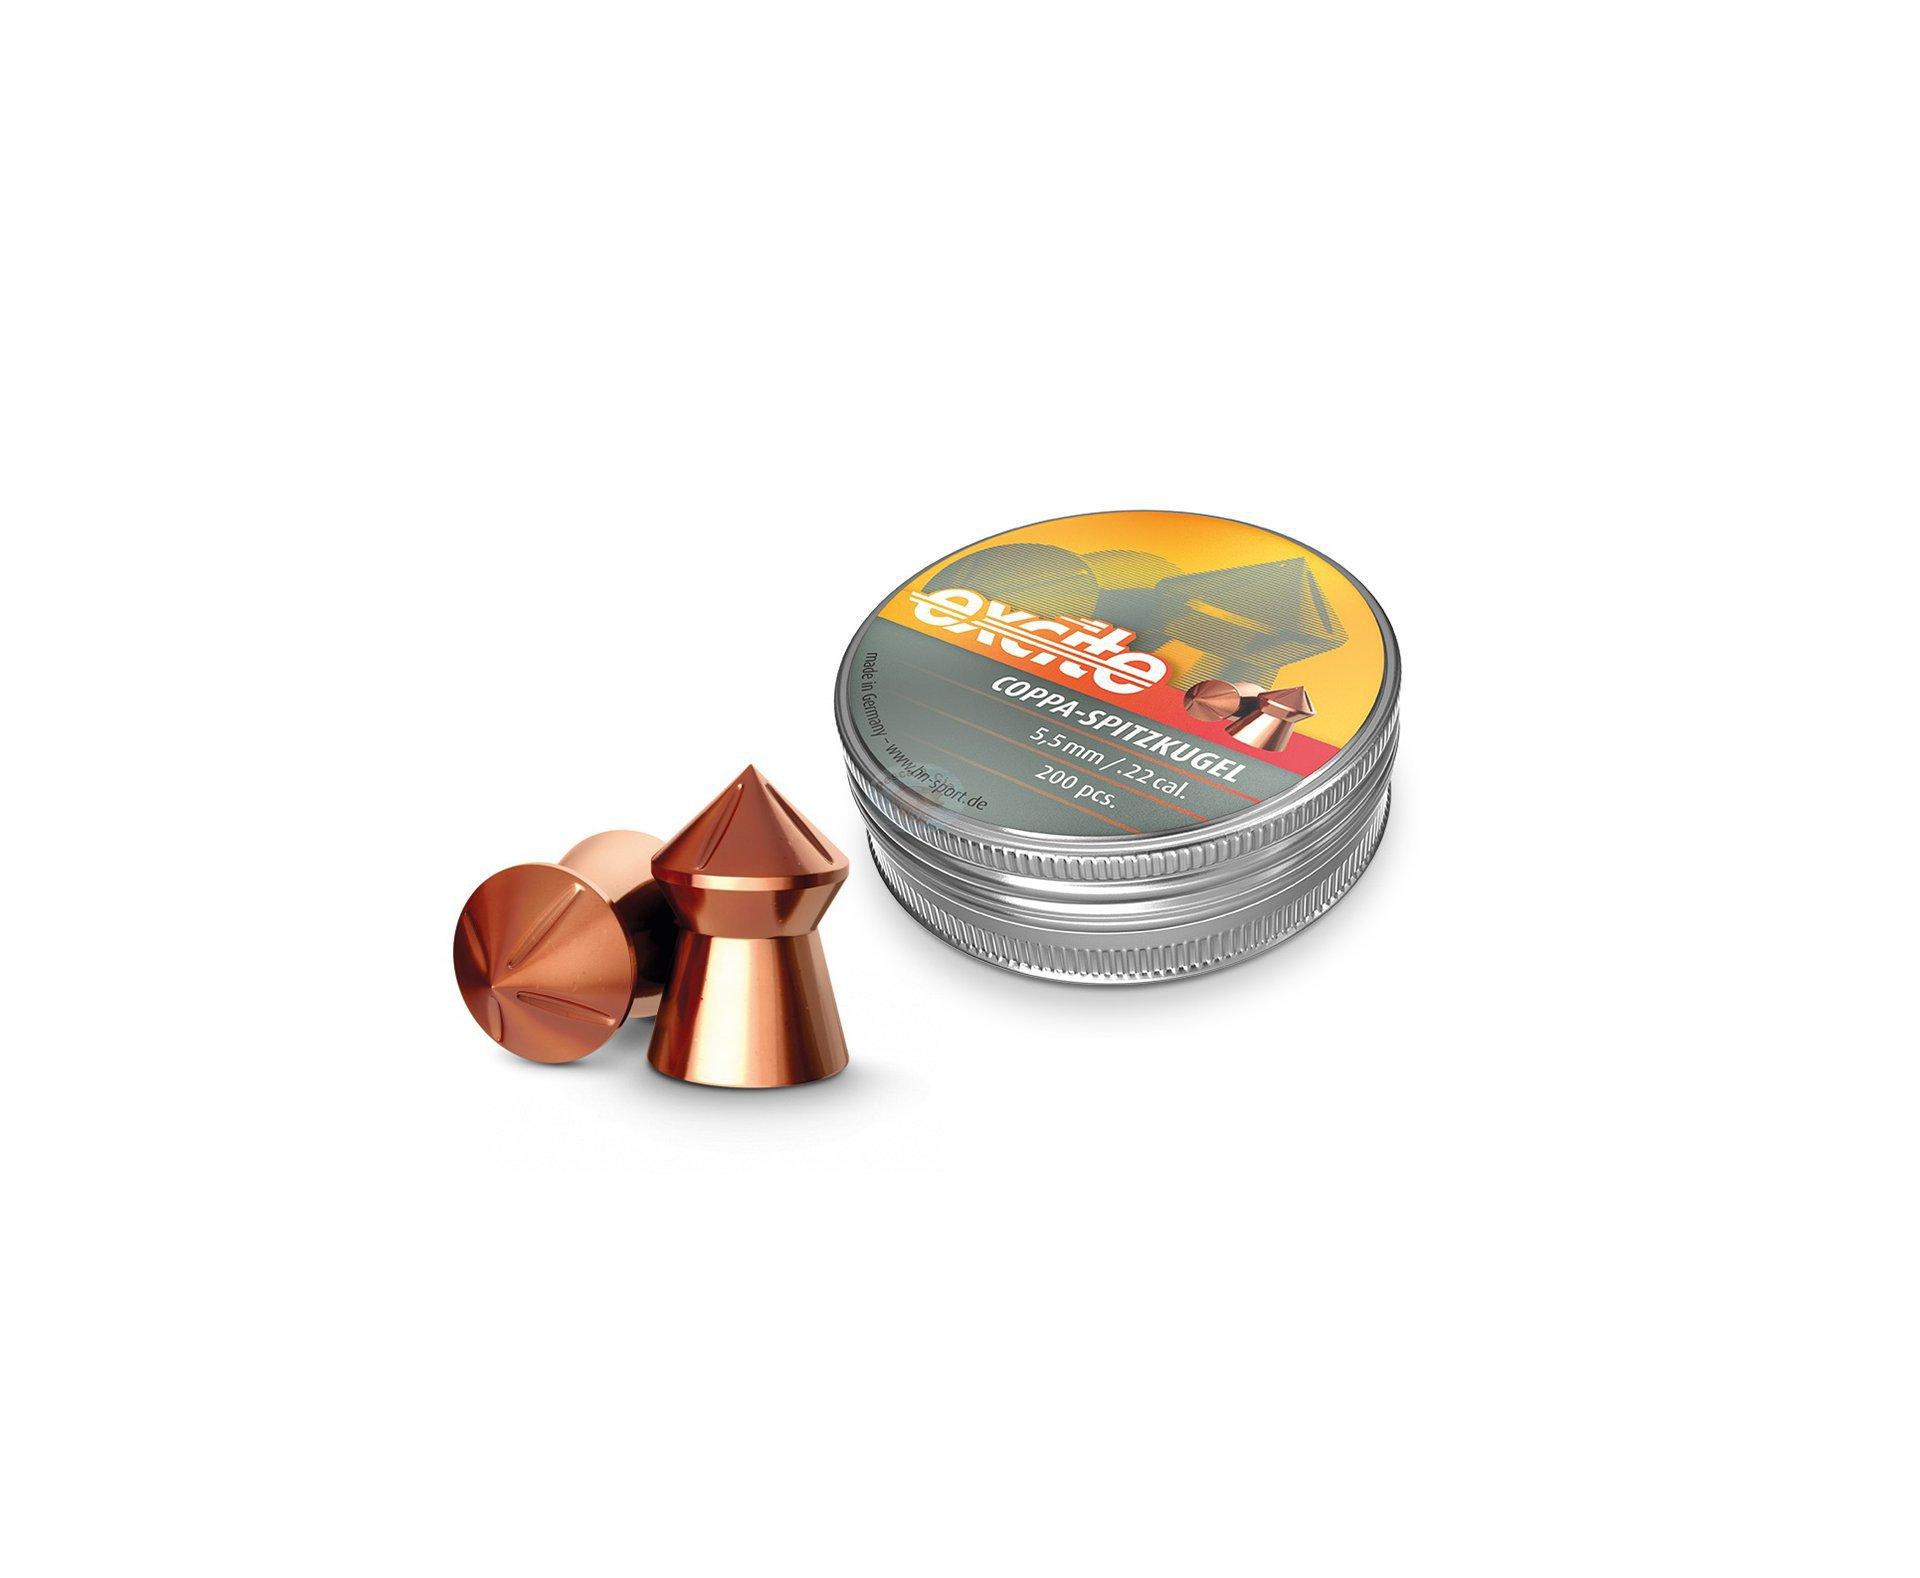 Chumbinho Profissional H&n Excite Coppa-spitzkugel Cobreado 5,5mm 200uni